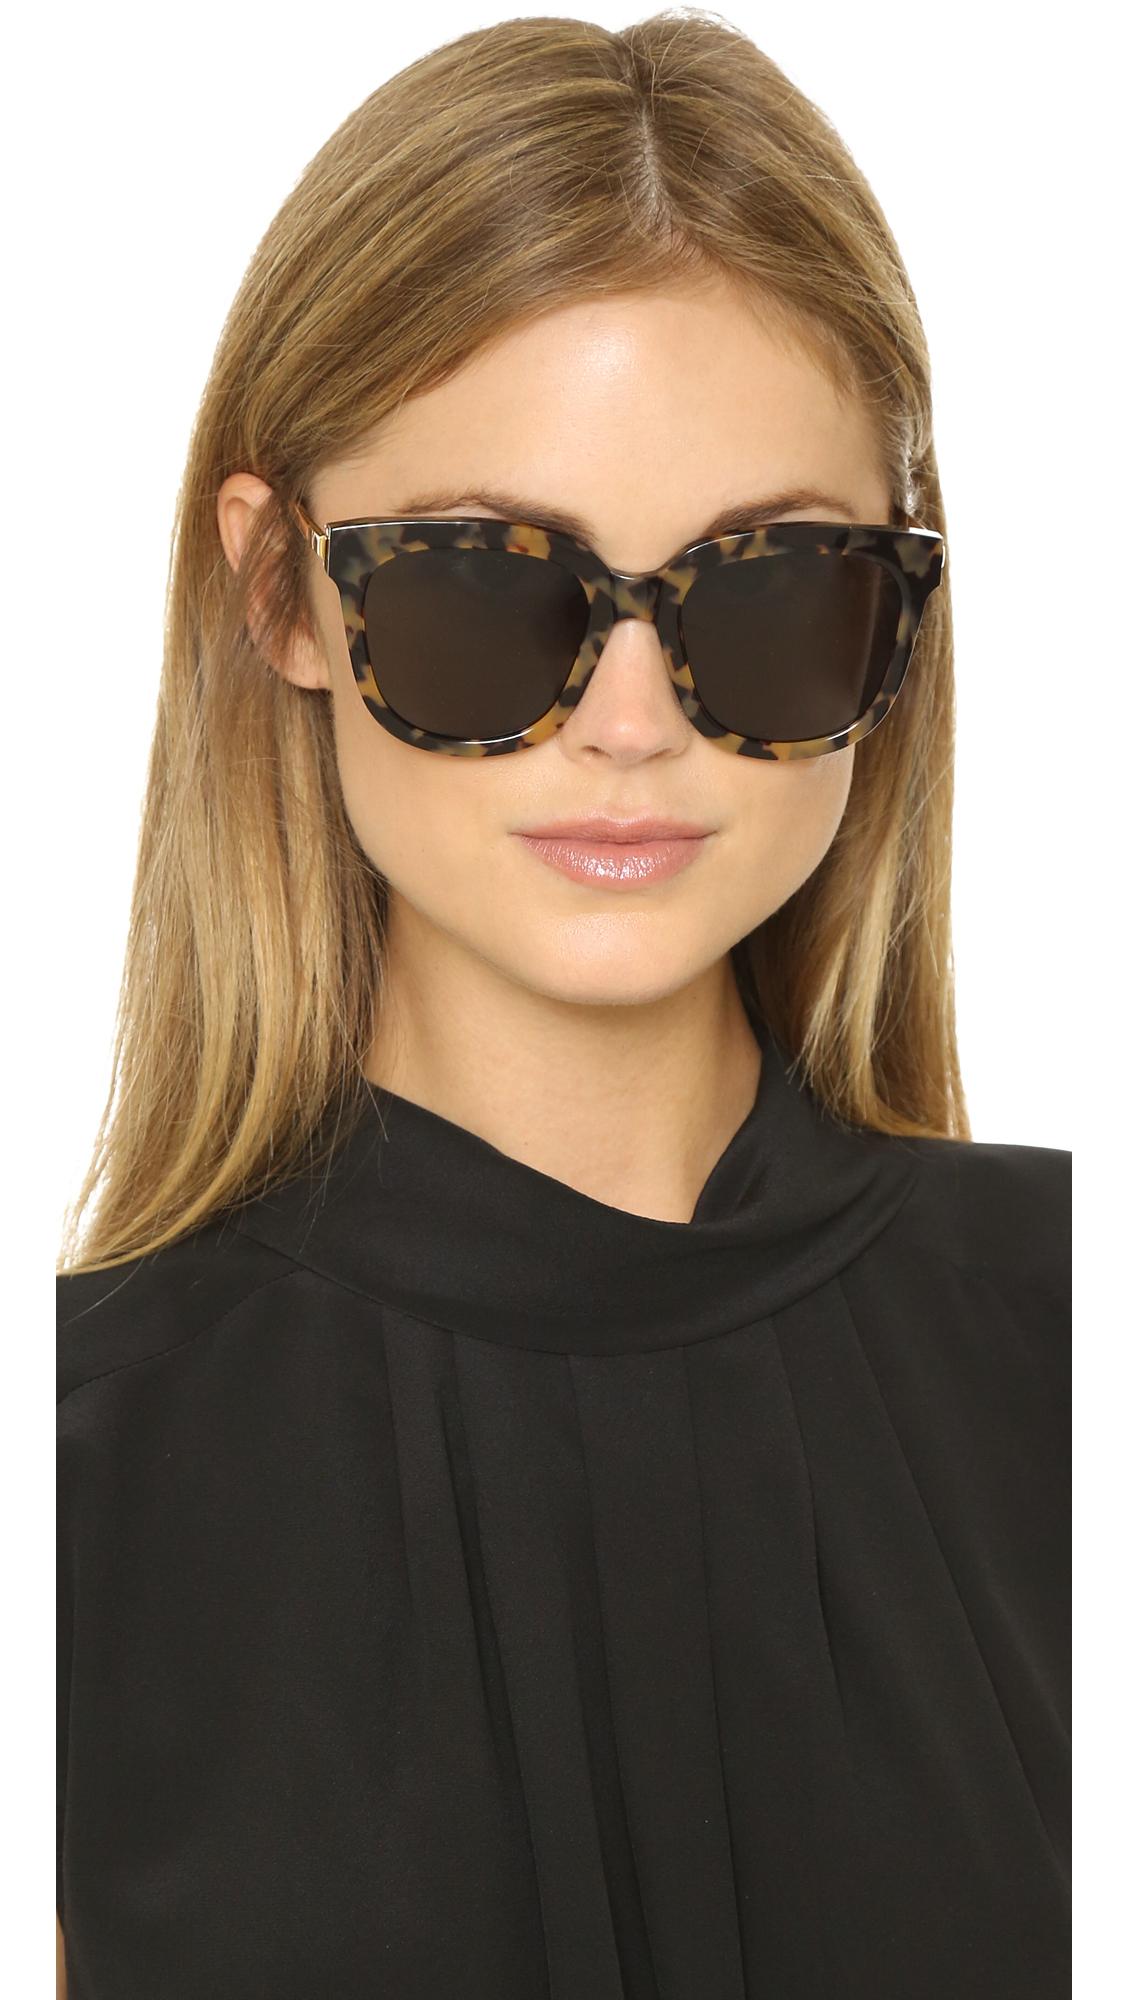 19ec740511 Gentle Monster Absente Sunglasses - Tortoise grey in Gray - Lyst